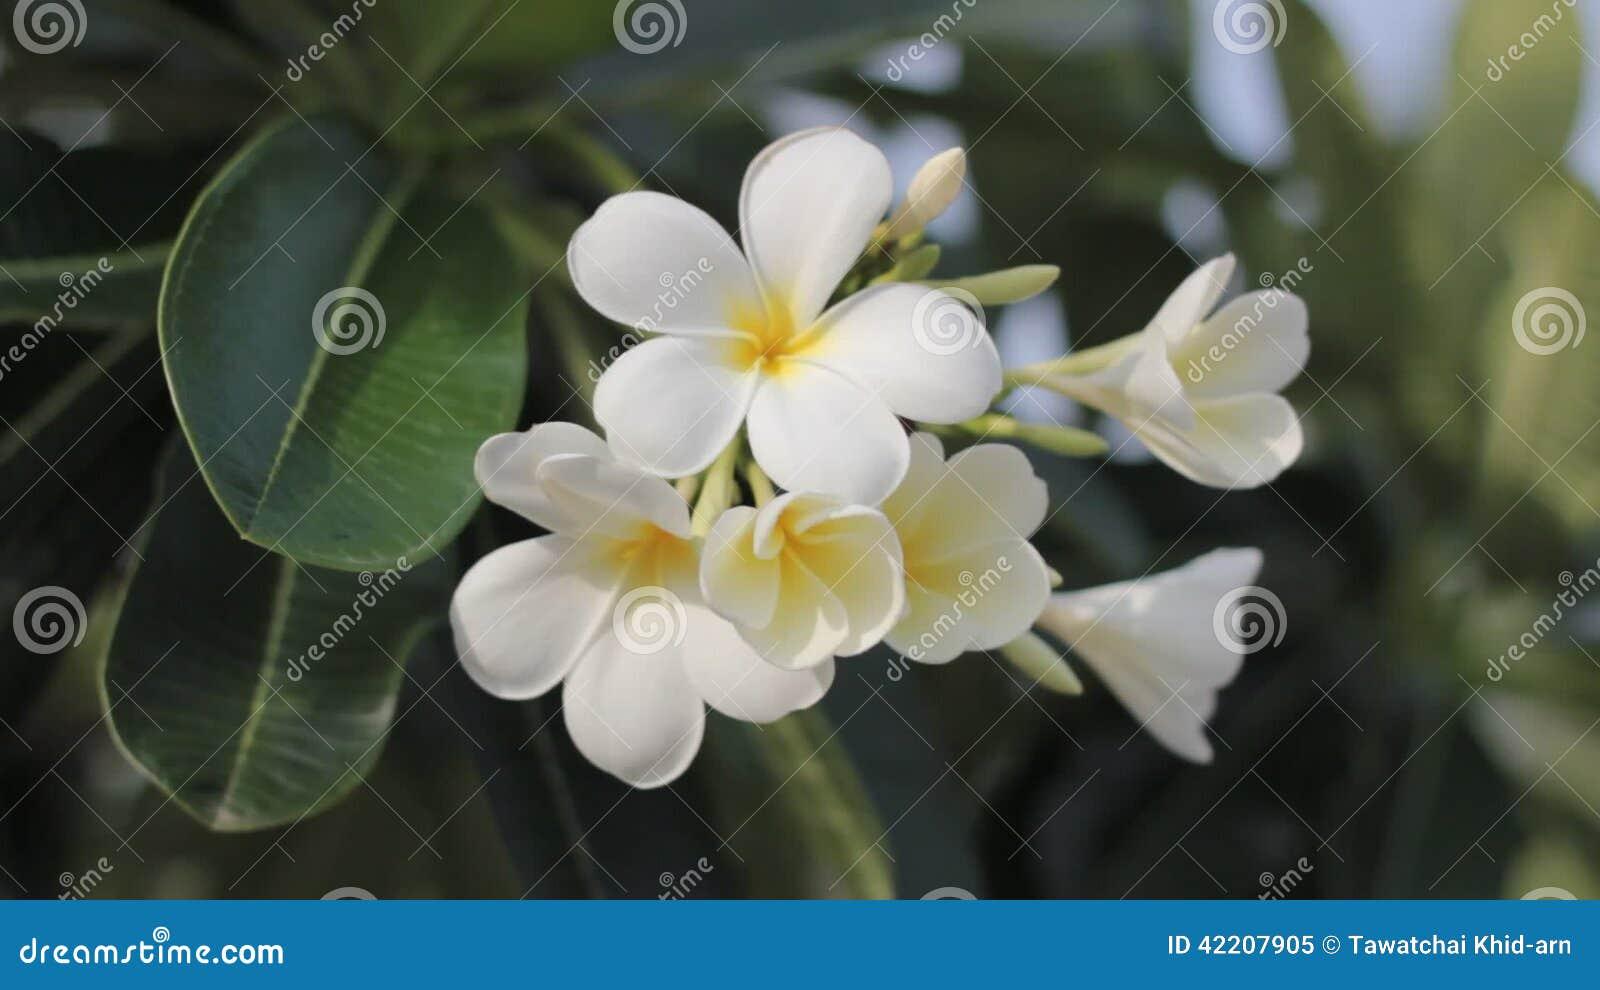 Hawaiian Plumeria Flowers Used To Make Aloha Leis Stock Video